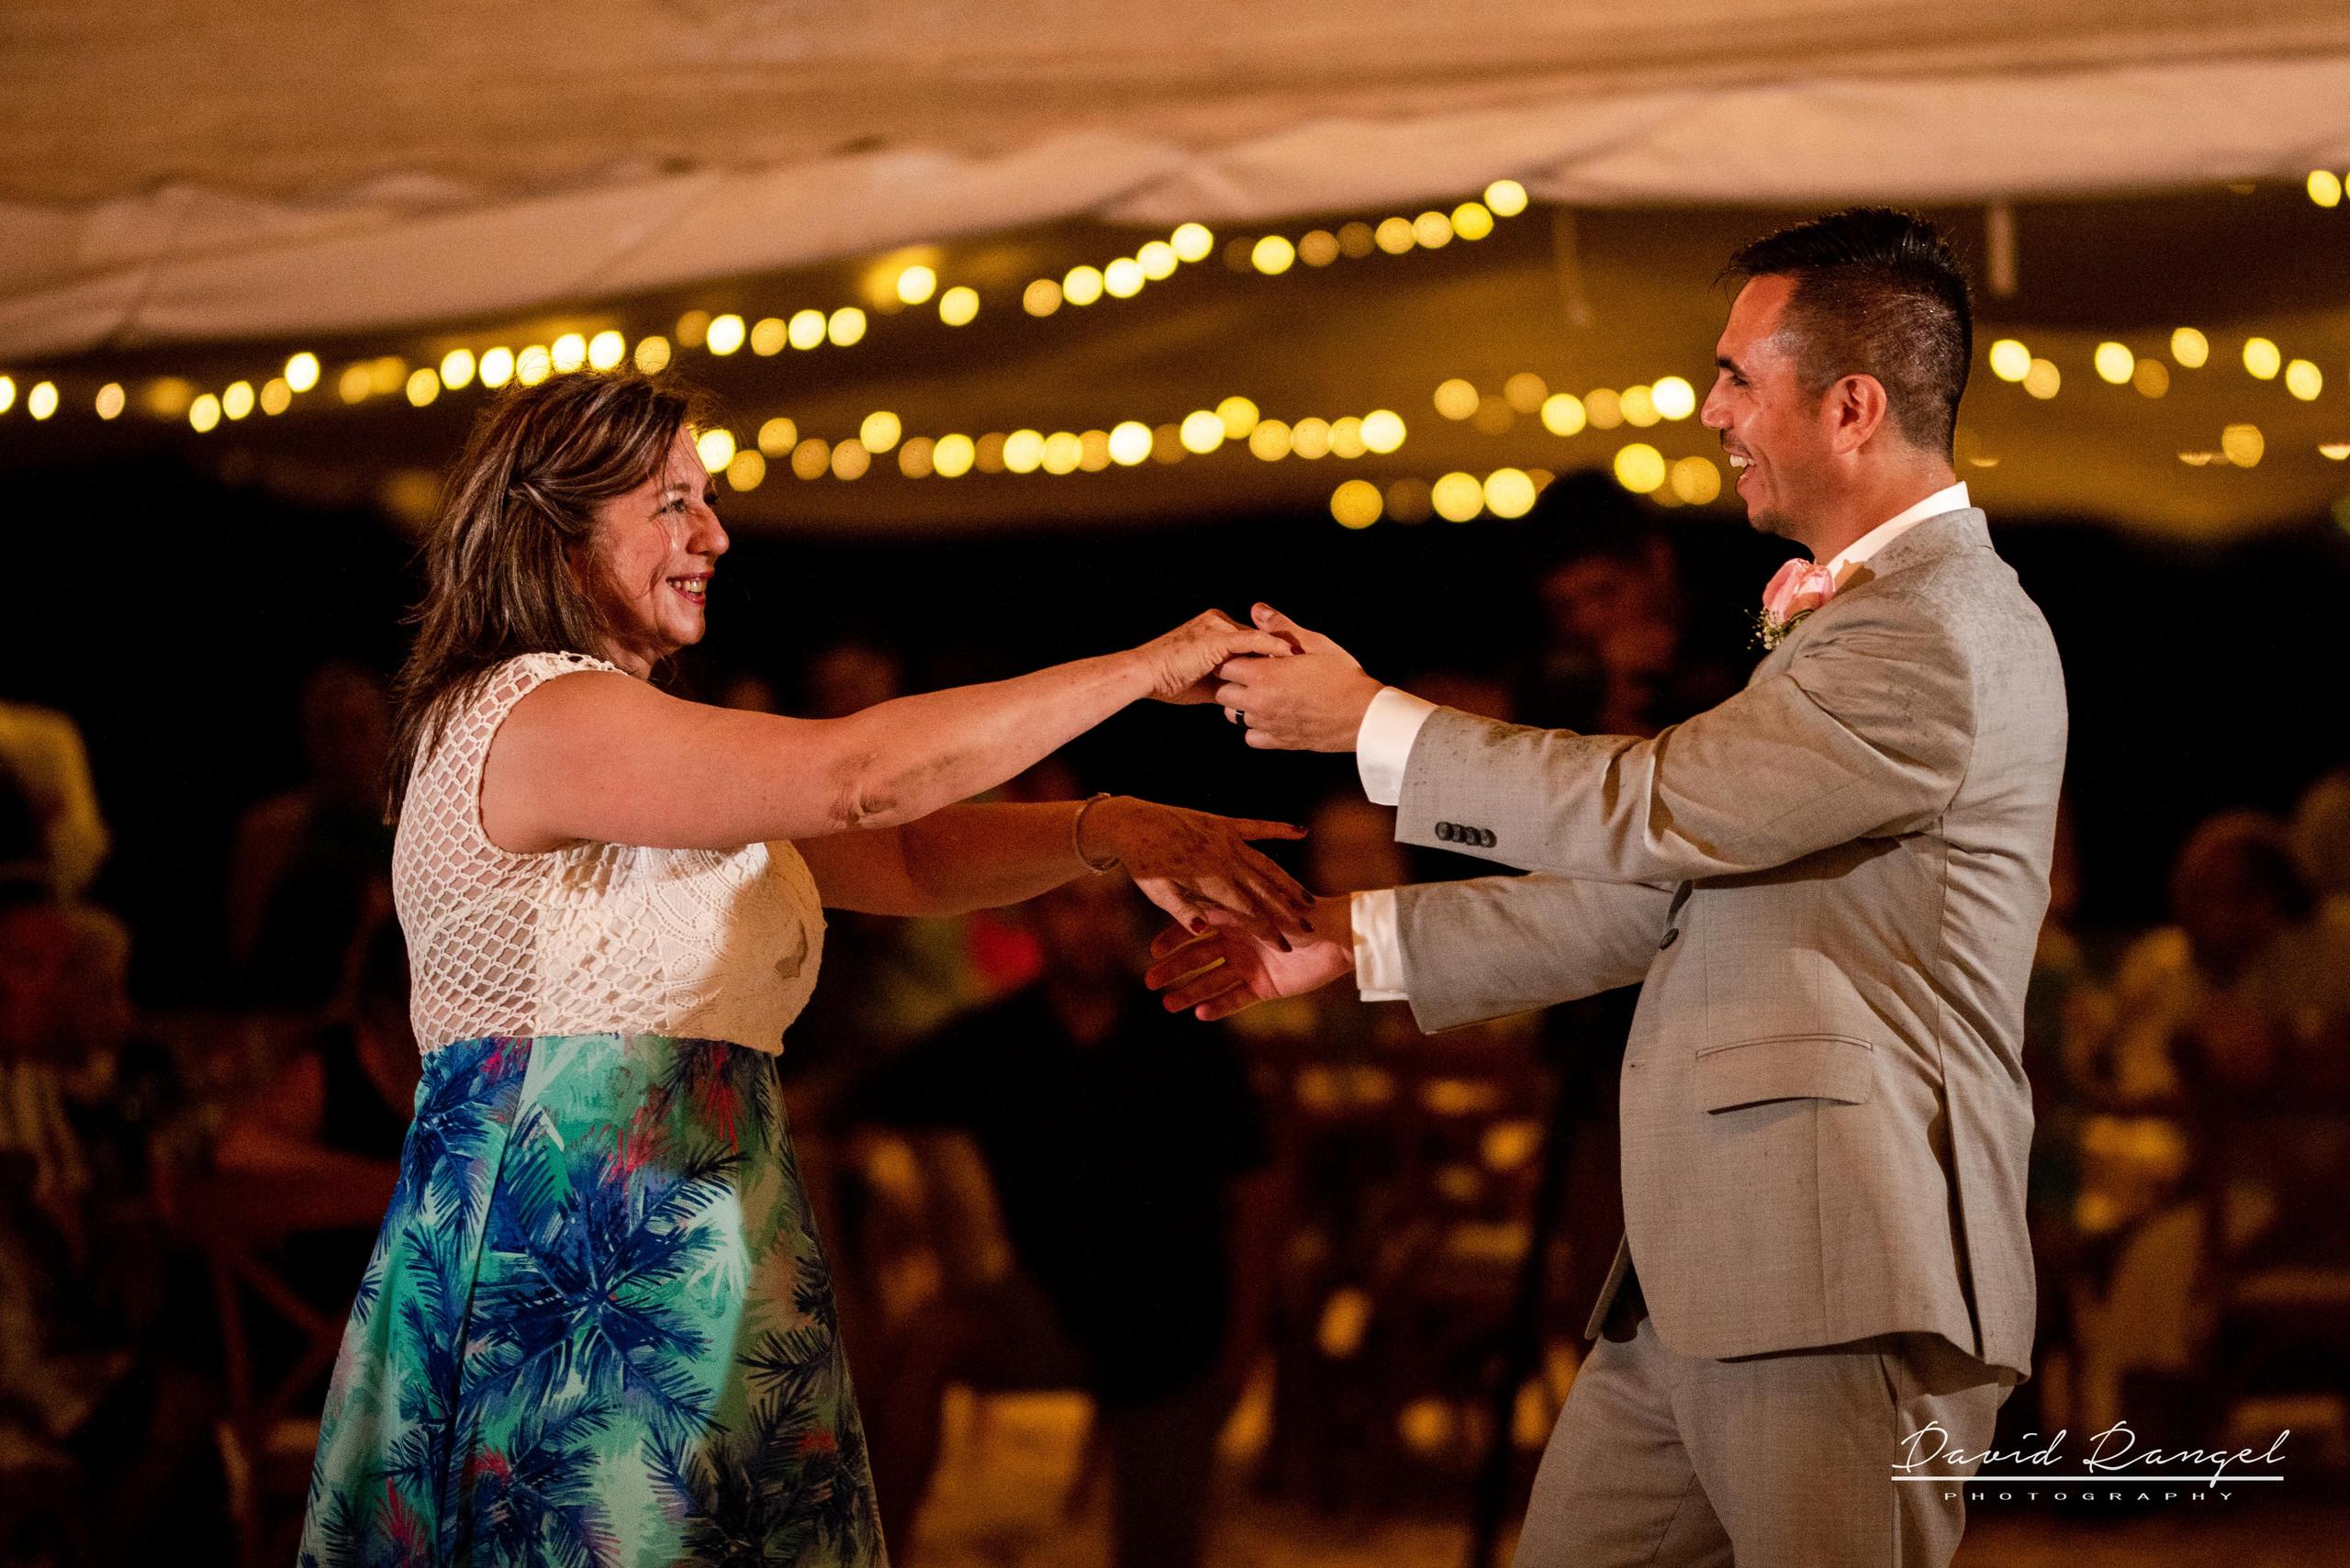 Beach+photo+session+couple+love+hugh+bride+groom+first+dance